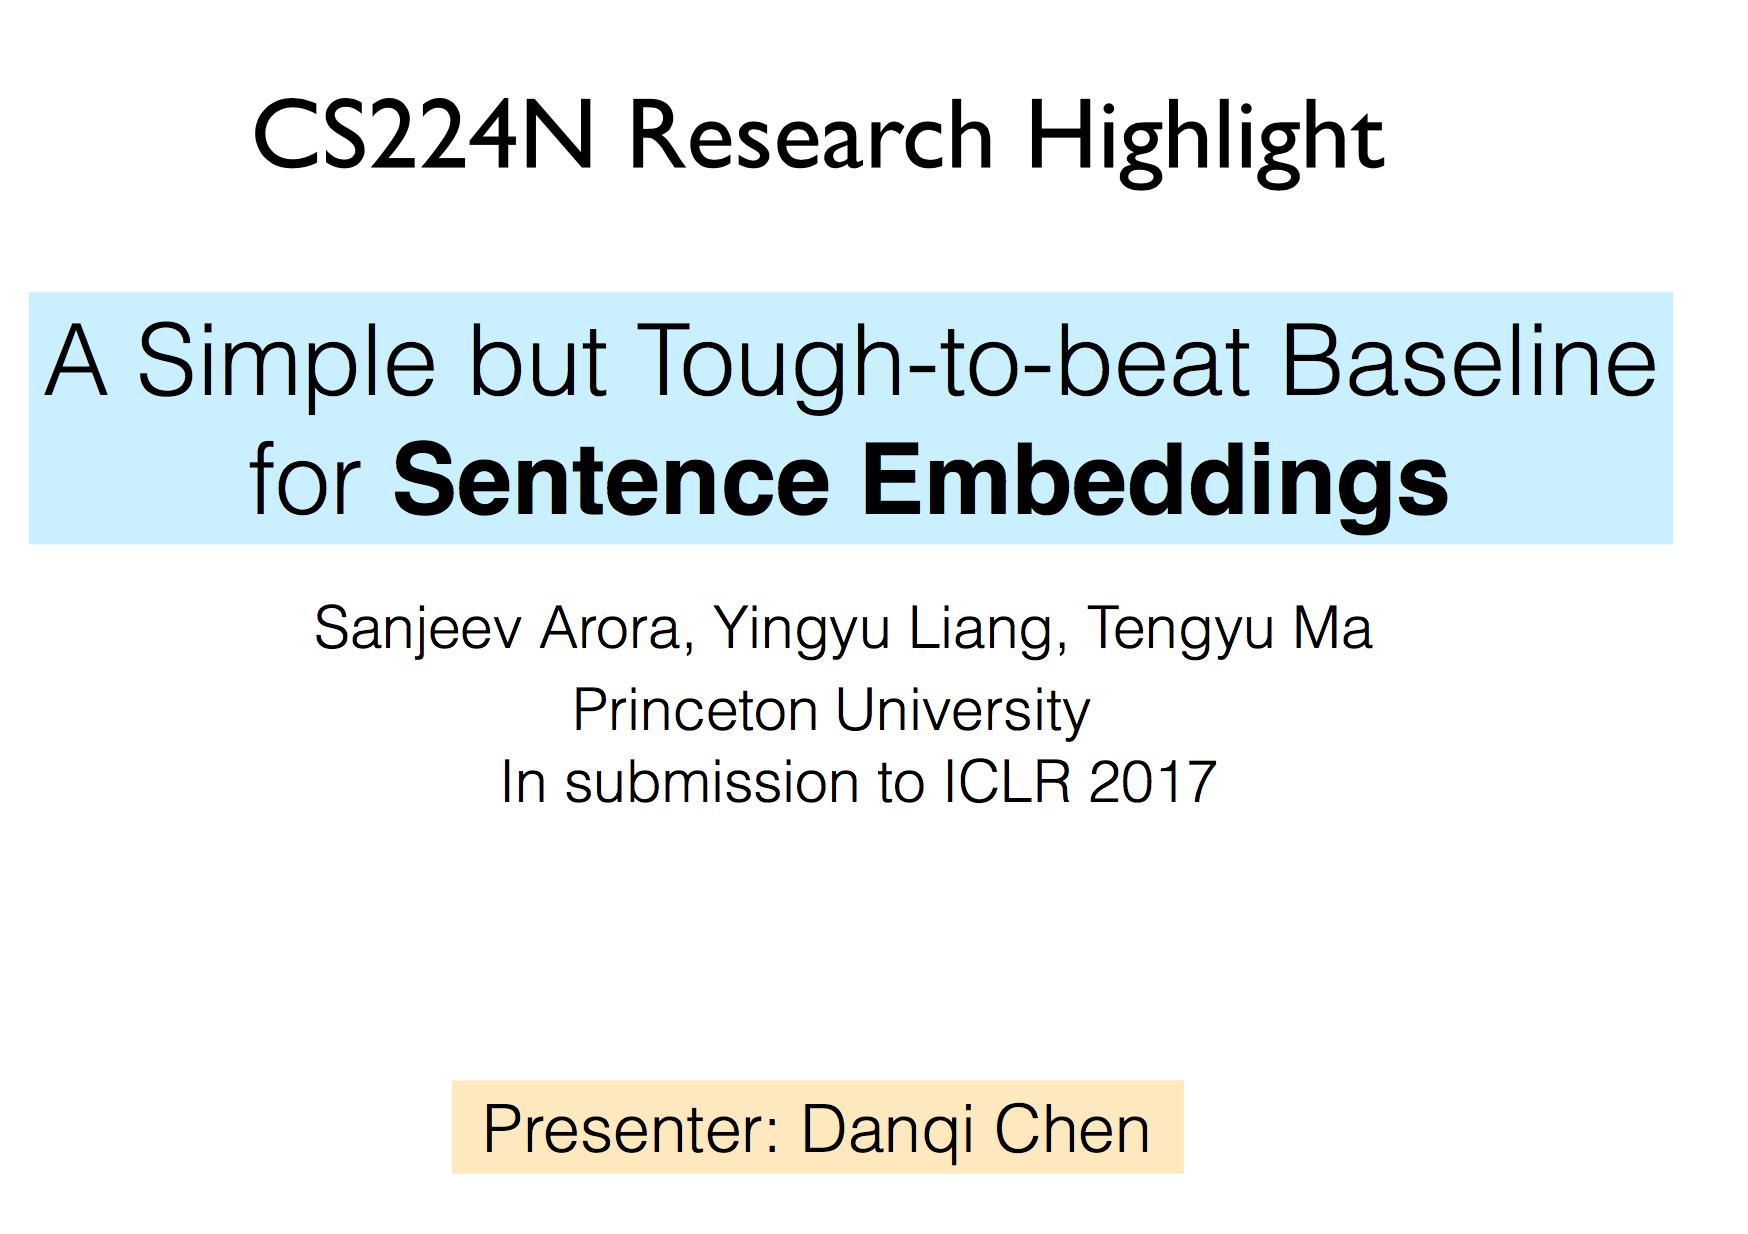 CS224n研究热点1 一个简单但很难超越的Sentence Embedding基线方法